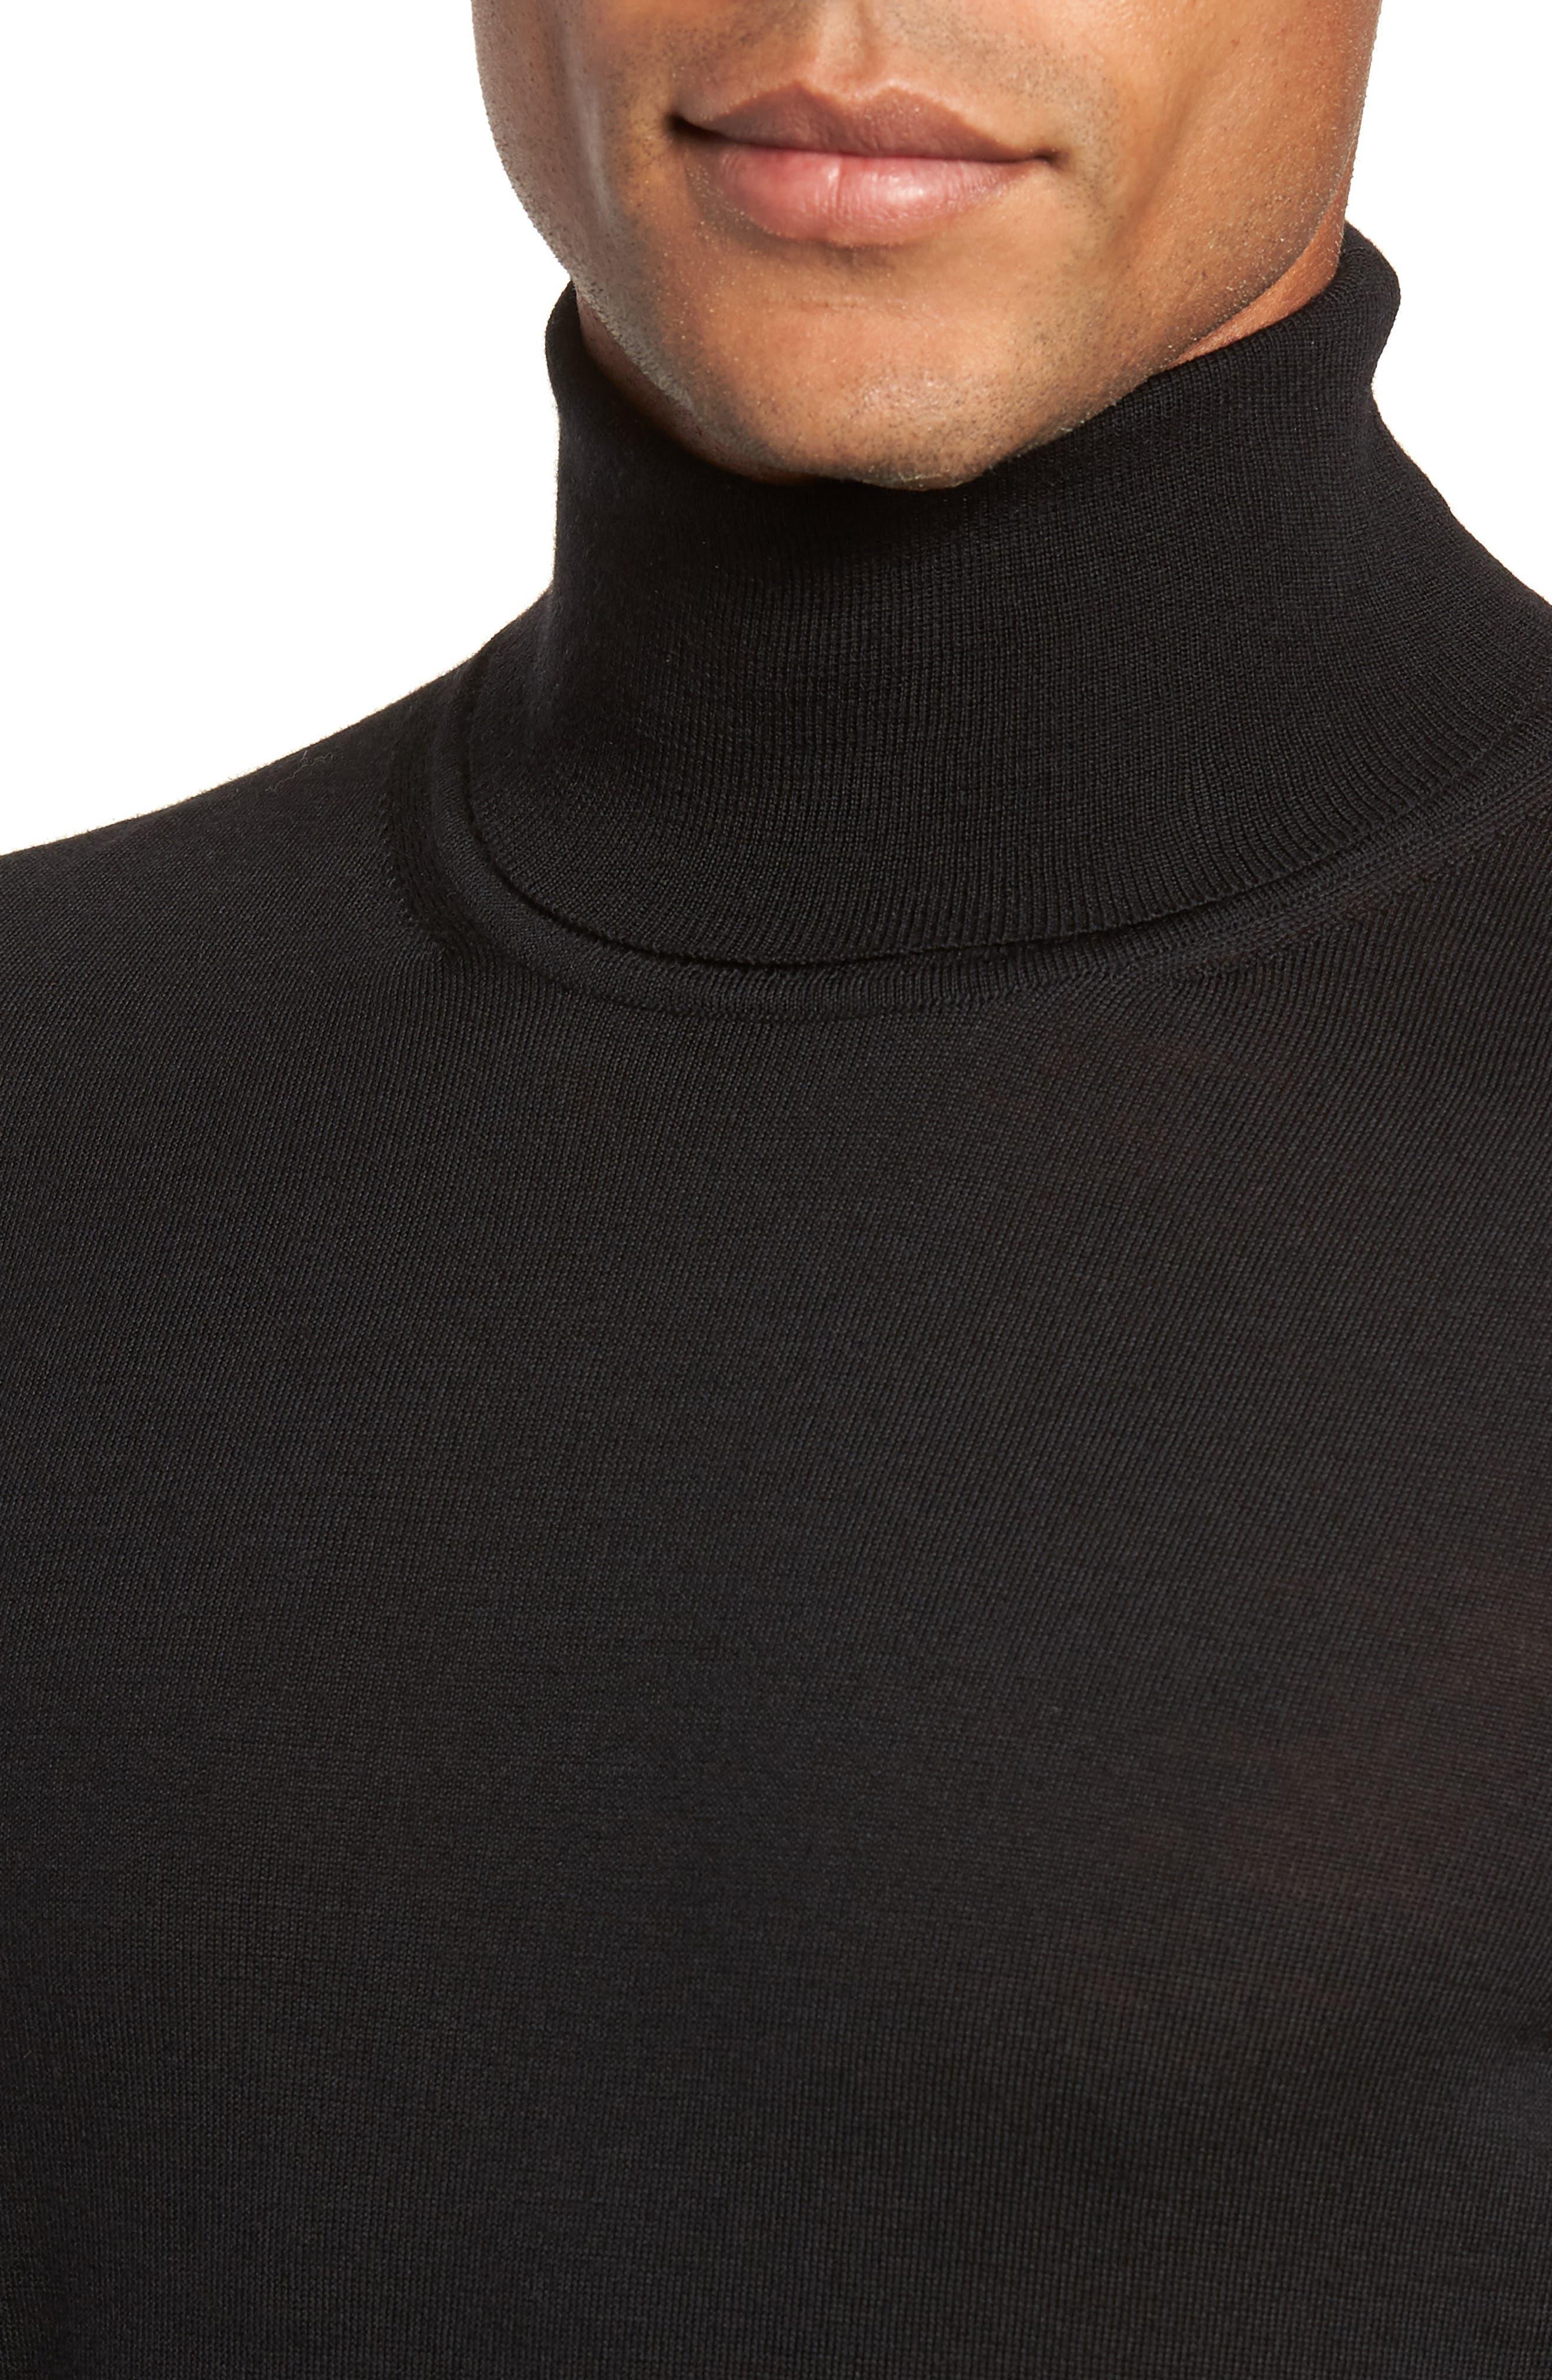 Musso Slim Fit Wool Turtleneck Sweater,                             Alternate thumbnail 4, color,                             BLACK